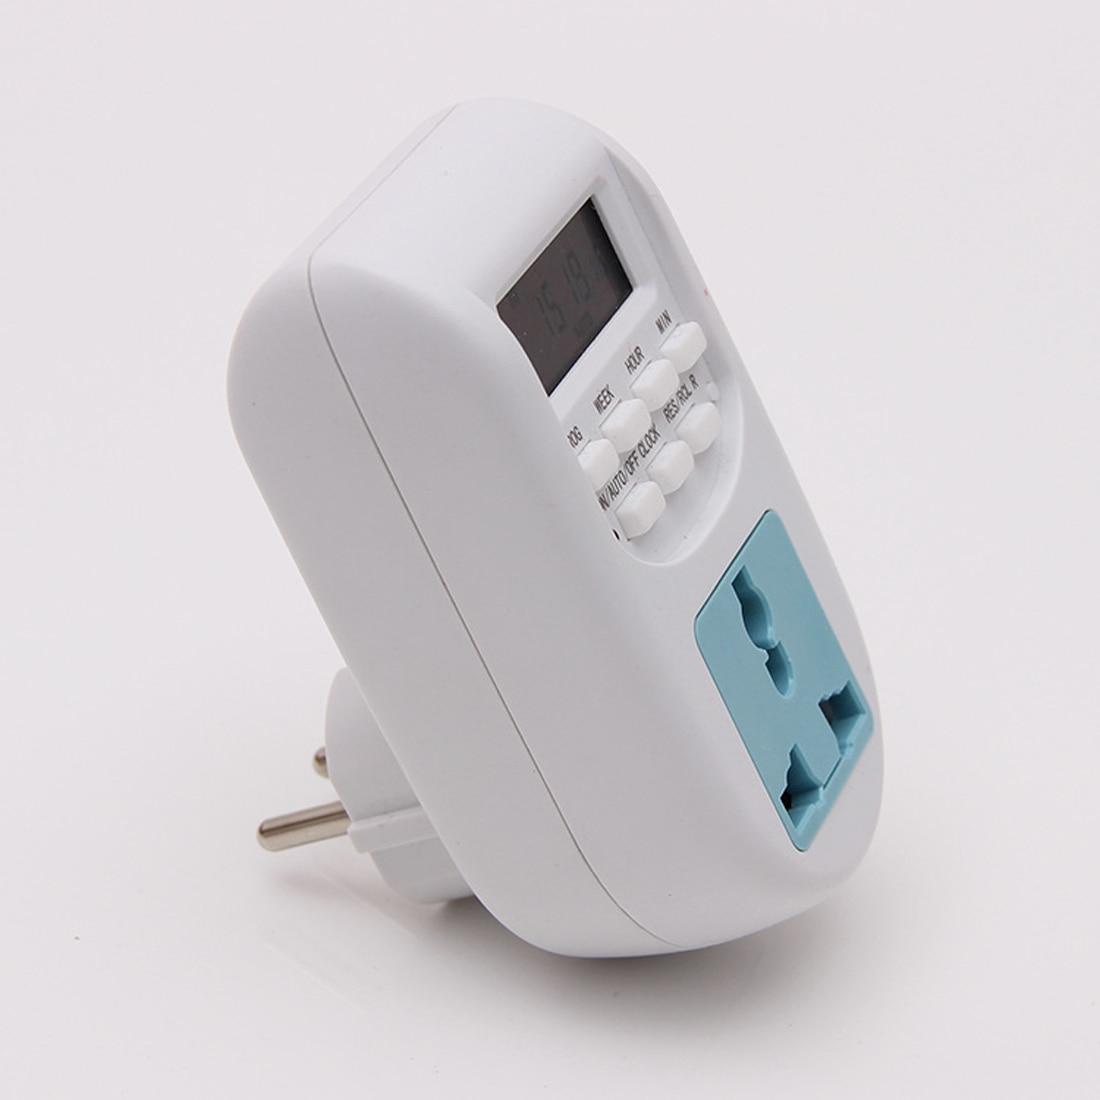 Digital Timer EU Plug New Energy Saving Timer Programmable Electronic Timer Socket  Household Appliances For Home Devices